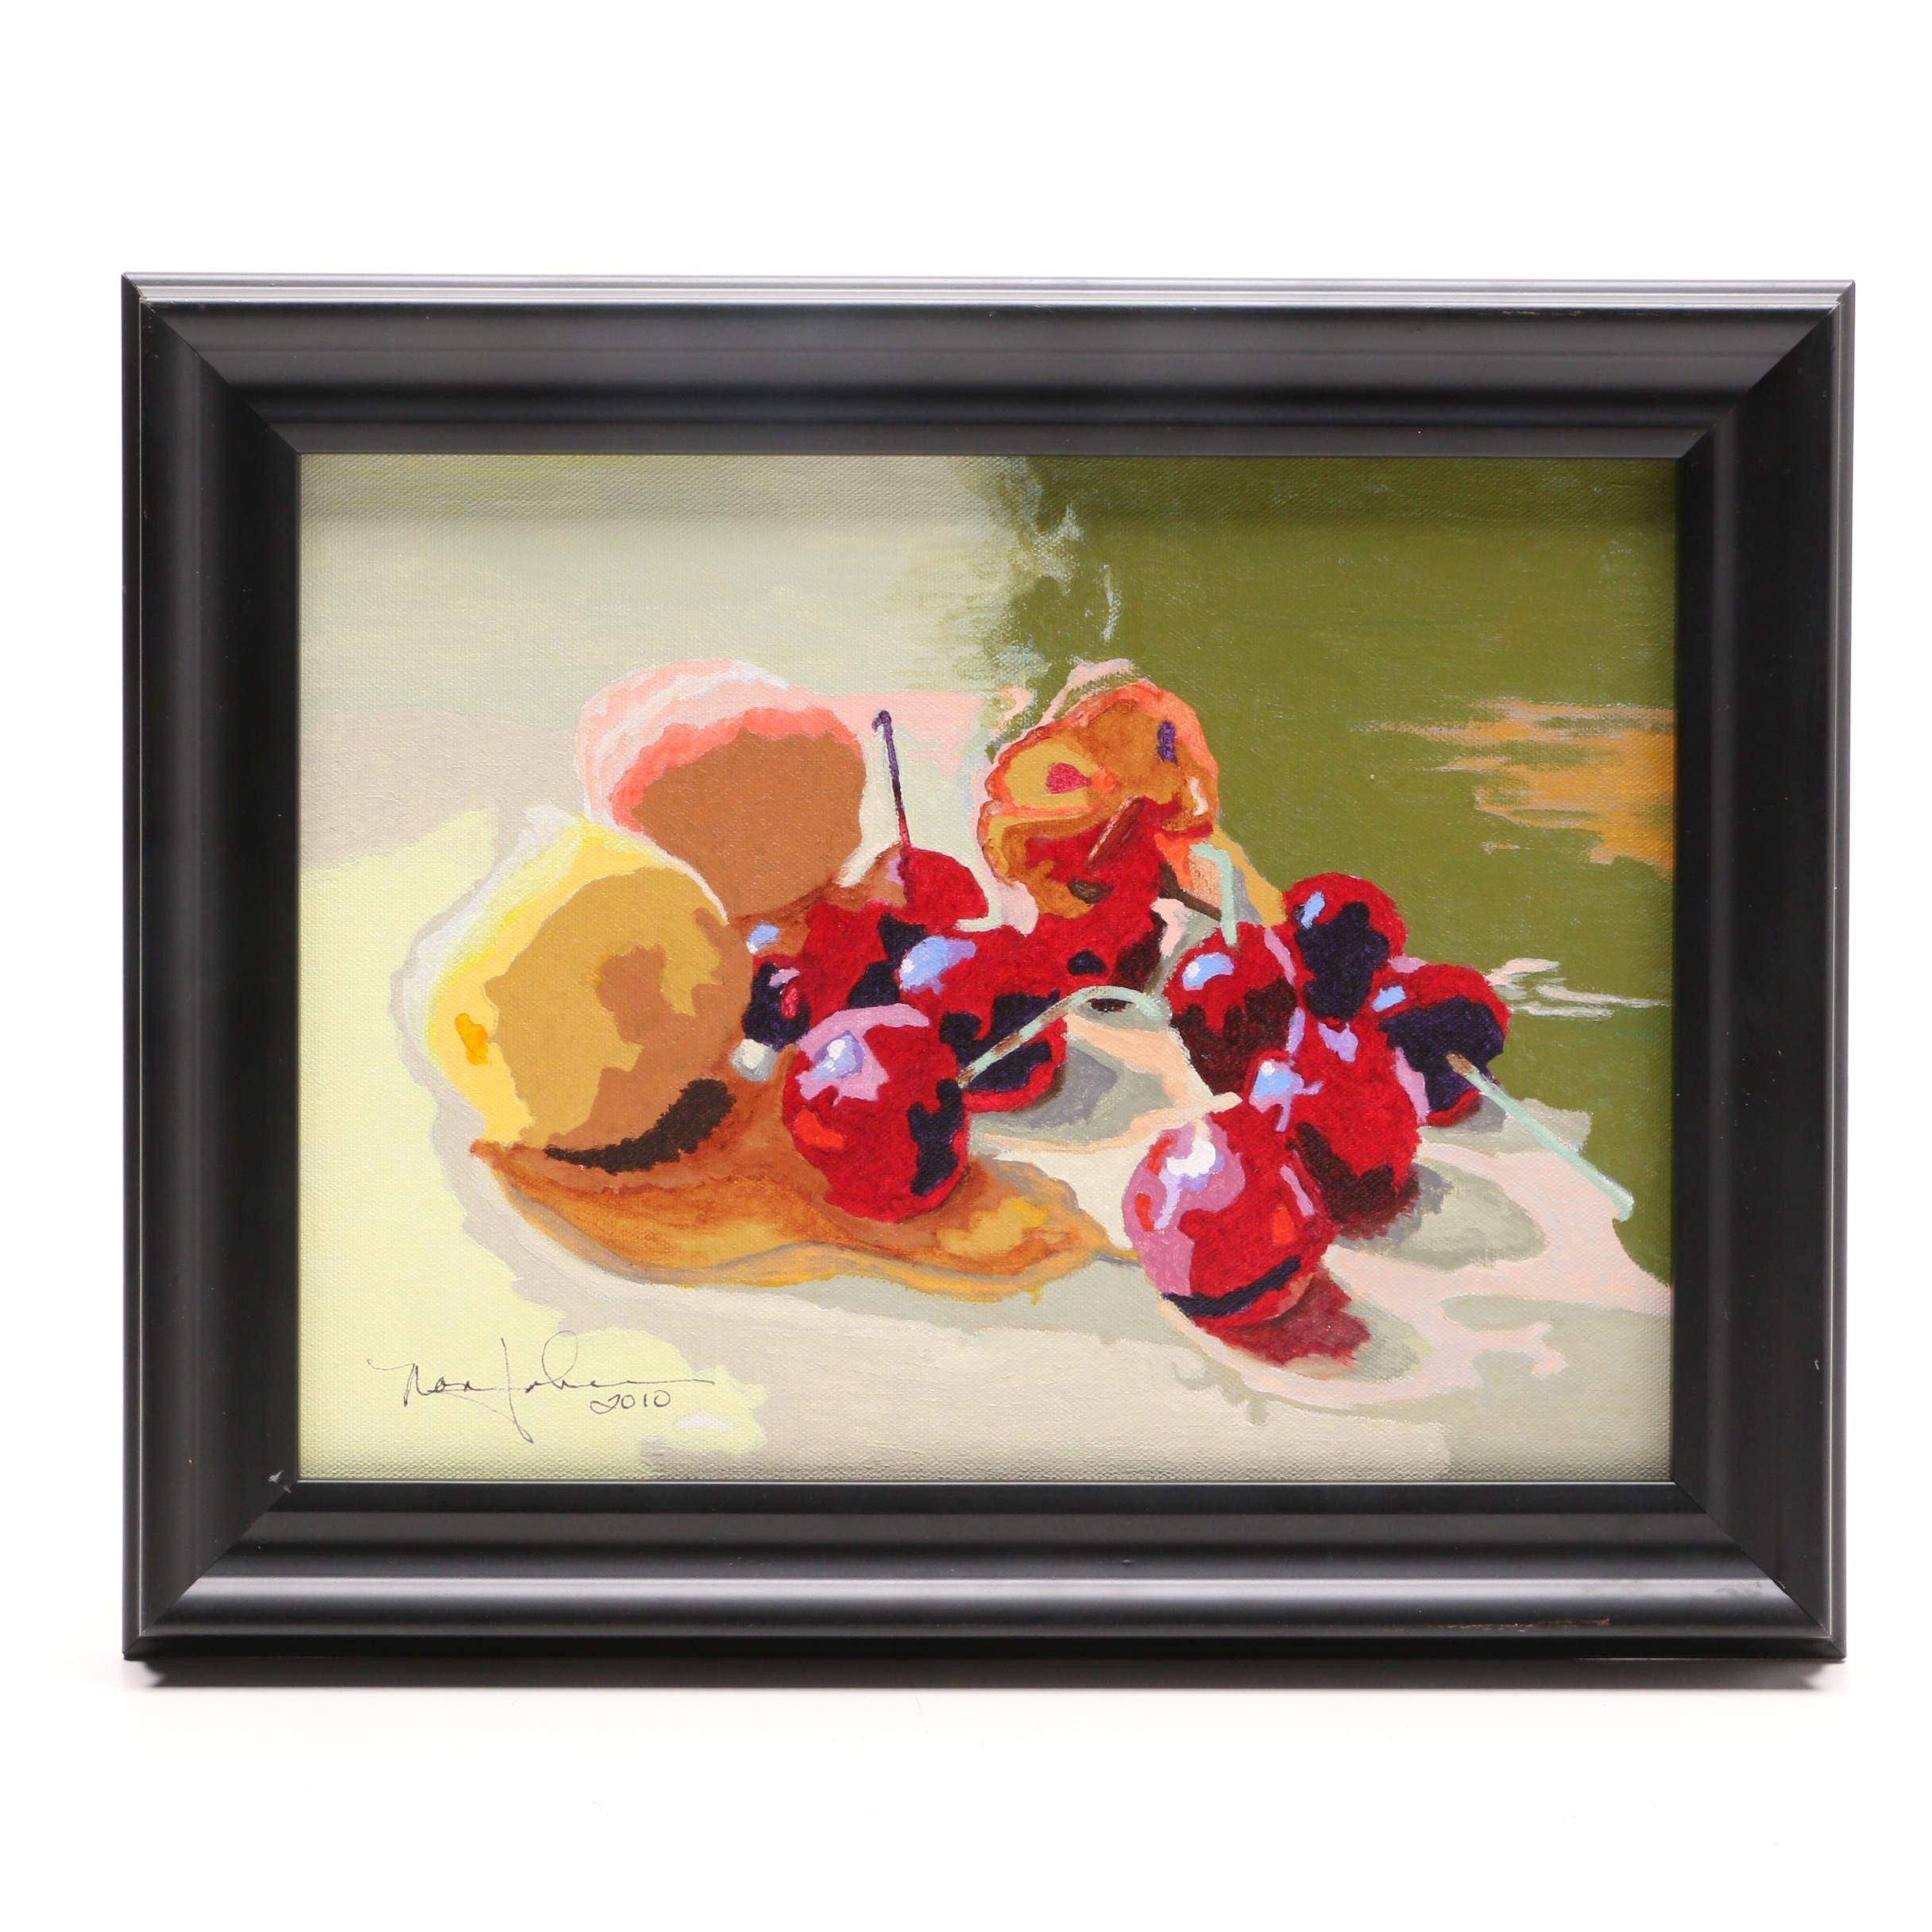 "2010 Nan Johnson Acrylic Painting ""Fruit Still Life"""